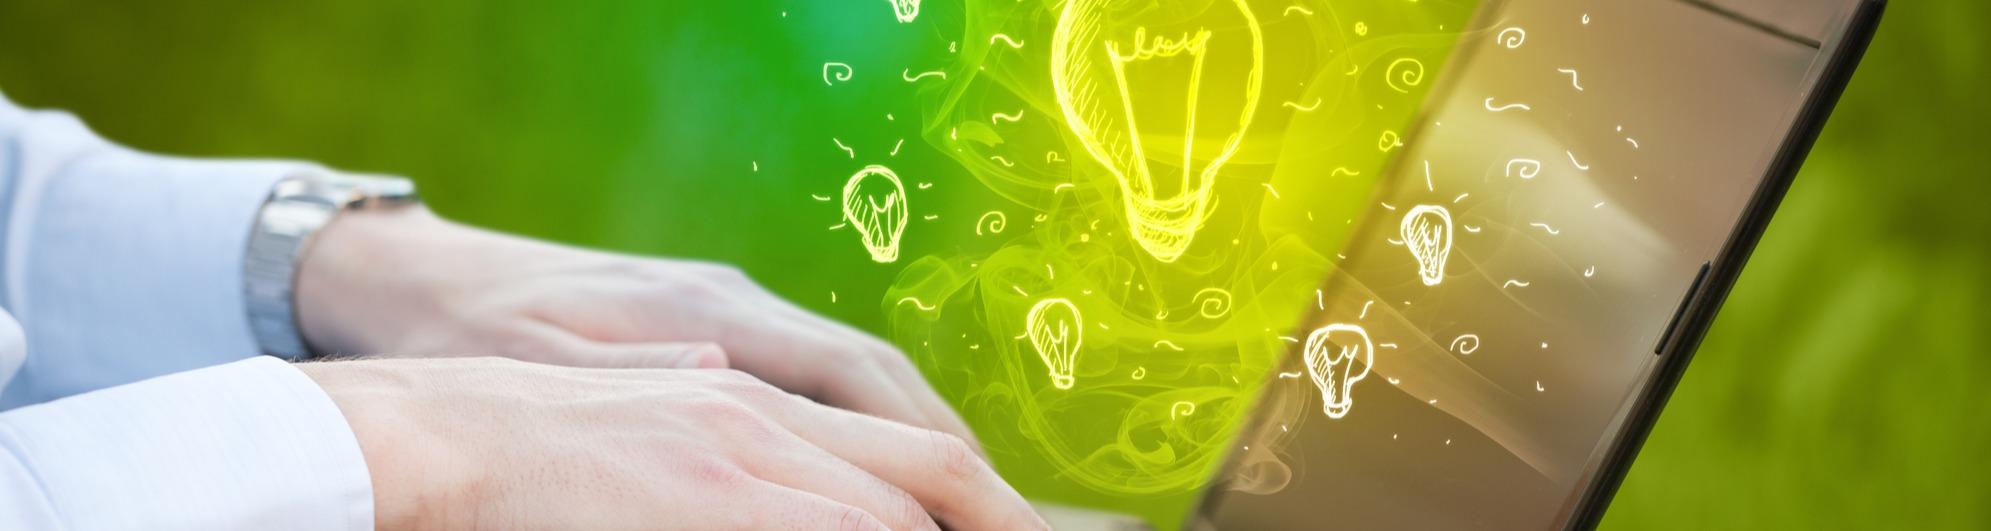 laptop lightbulb ideas